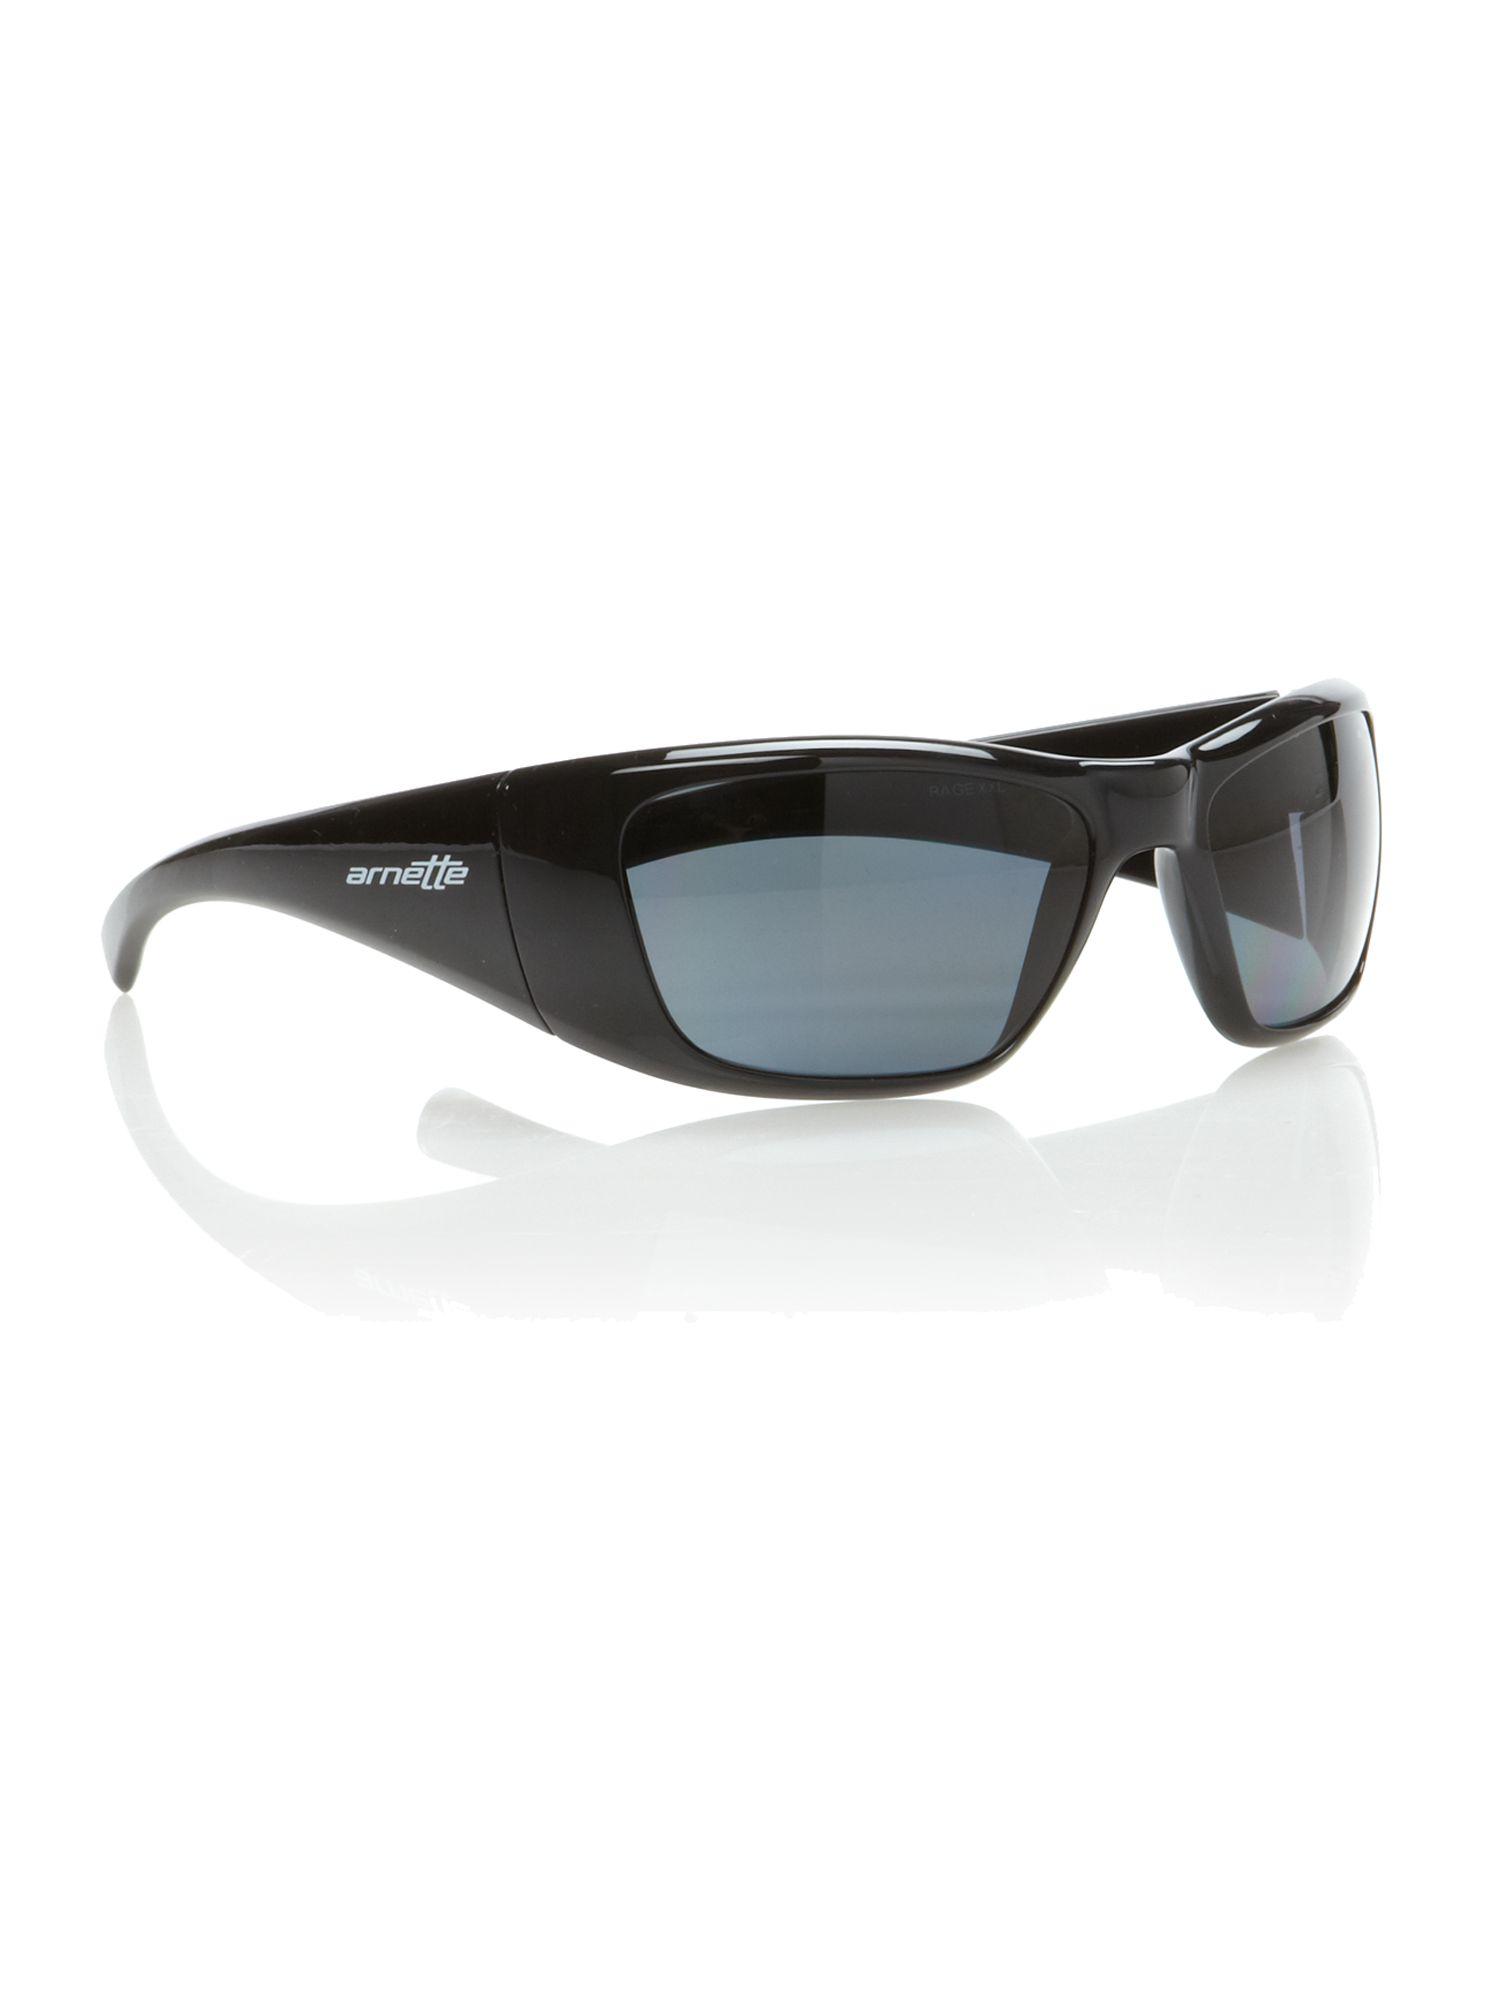 e32a63e64e Arnette Men s Sunglasses